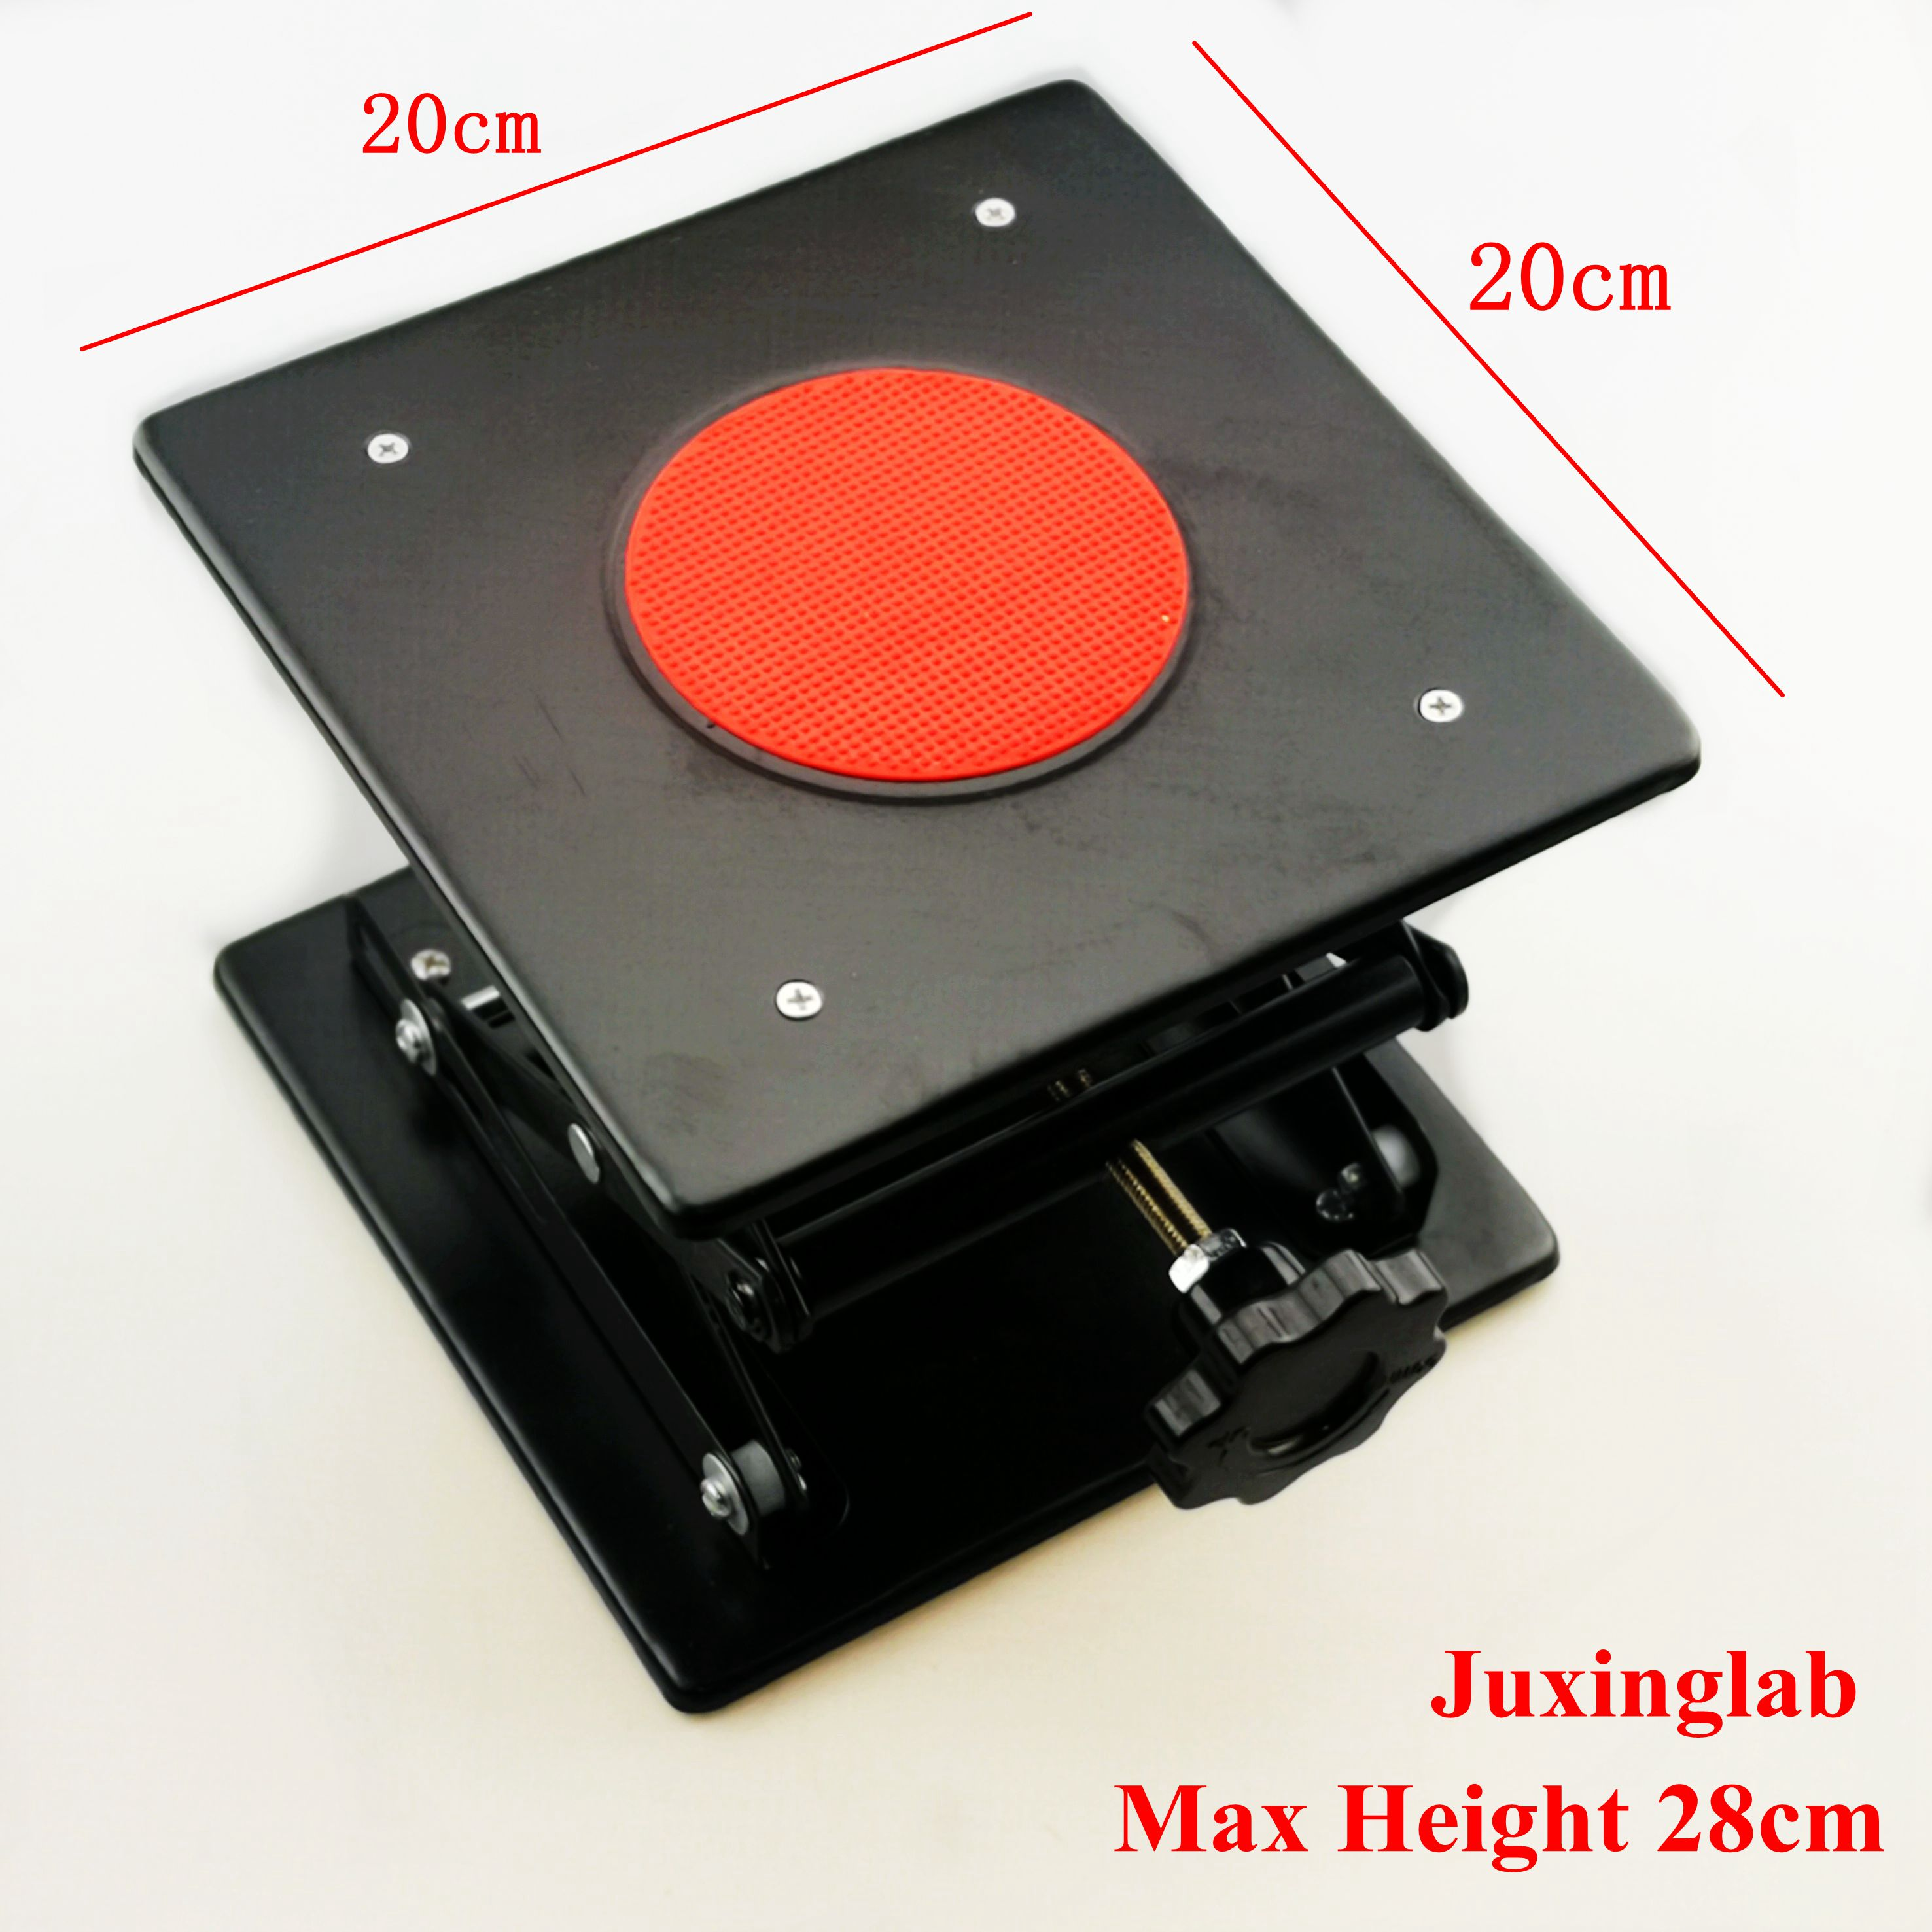 Lab Jack Laboratory Support Jacks black color 200x200x280mm Steel Painting Lifting Table Raising Platform 8''inch